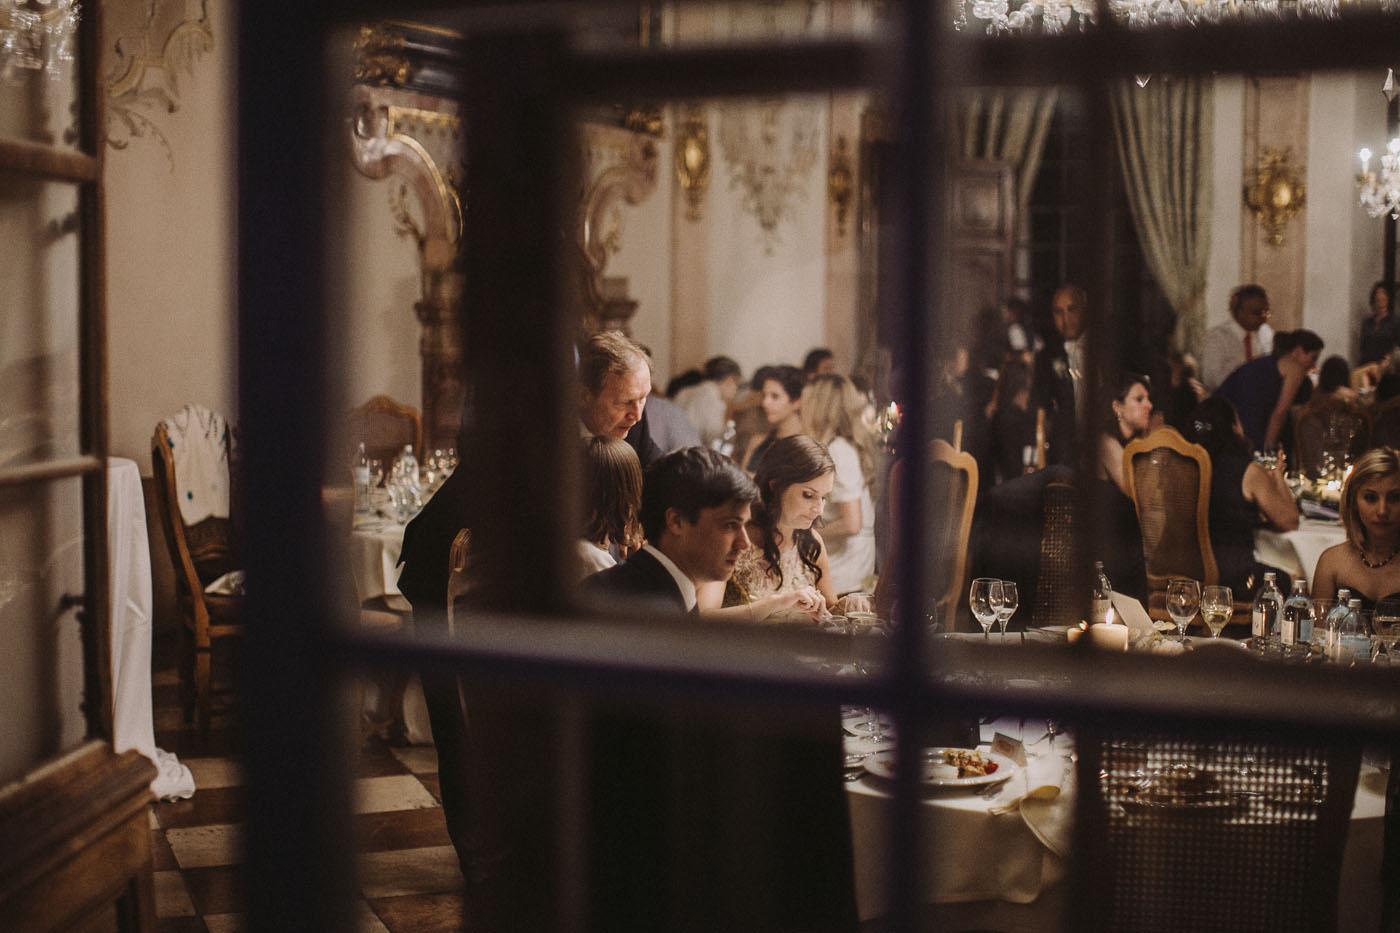 wedding-leopoldskron-photographer-74